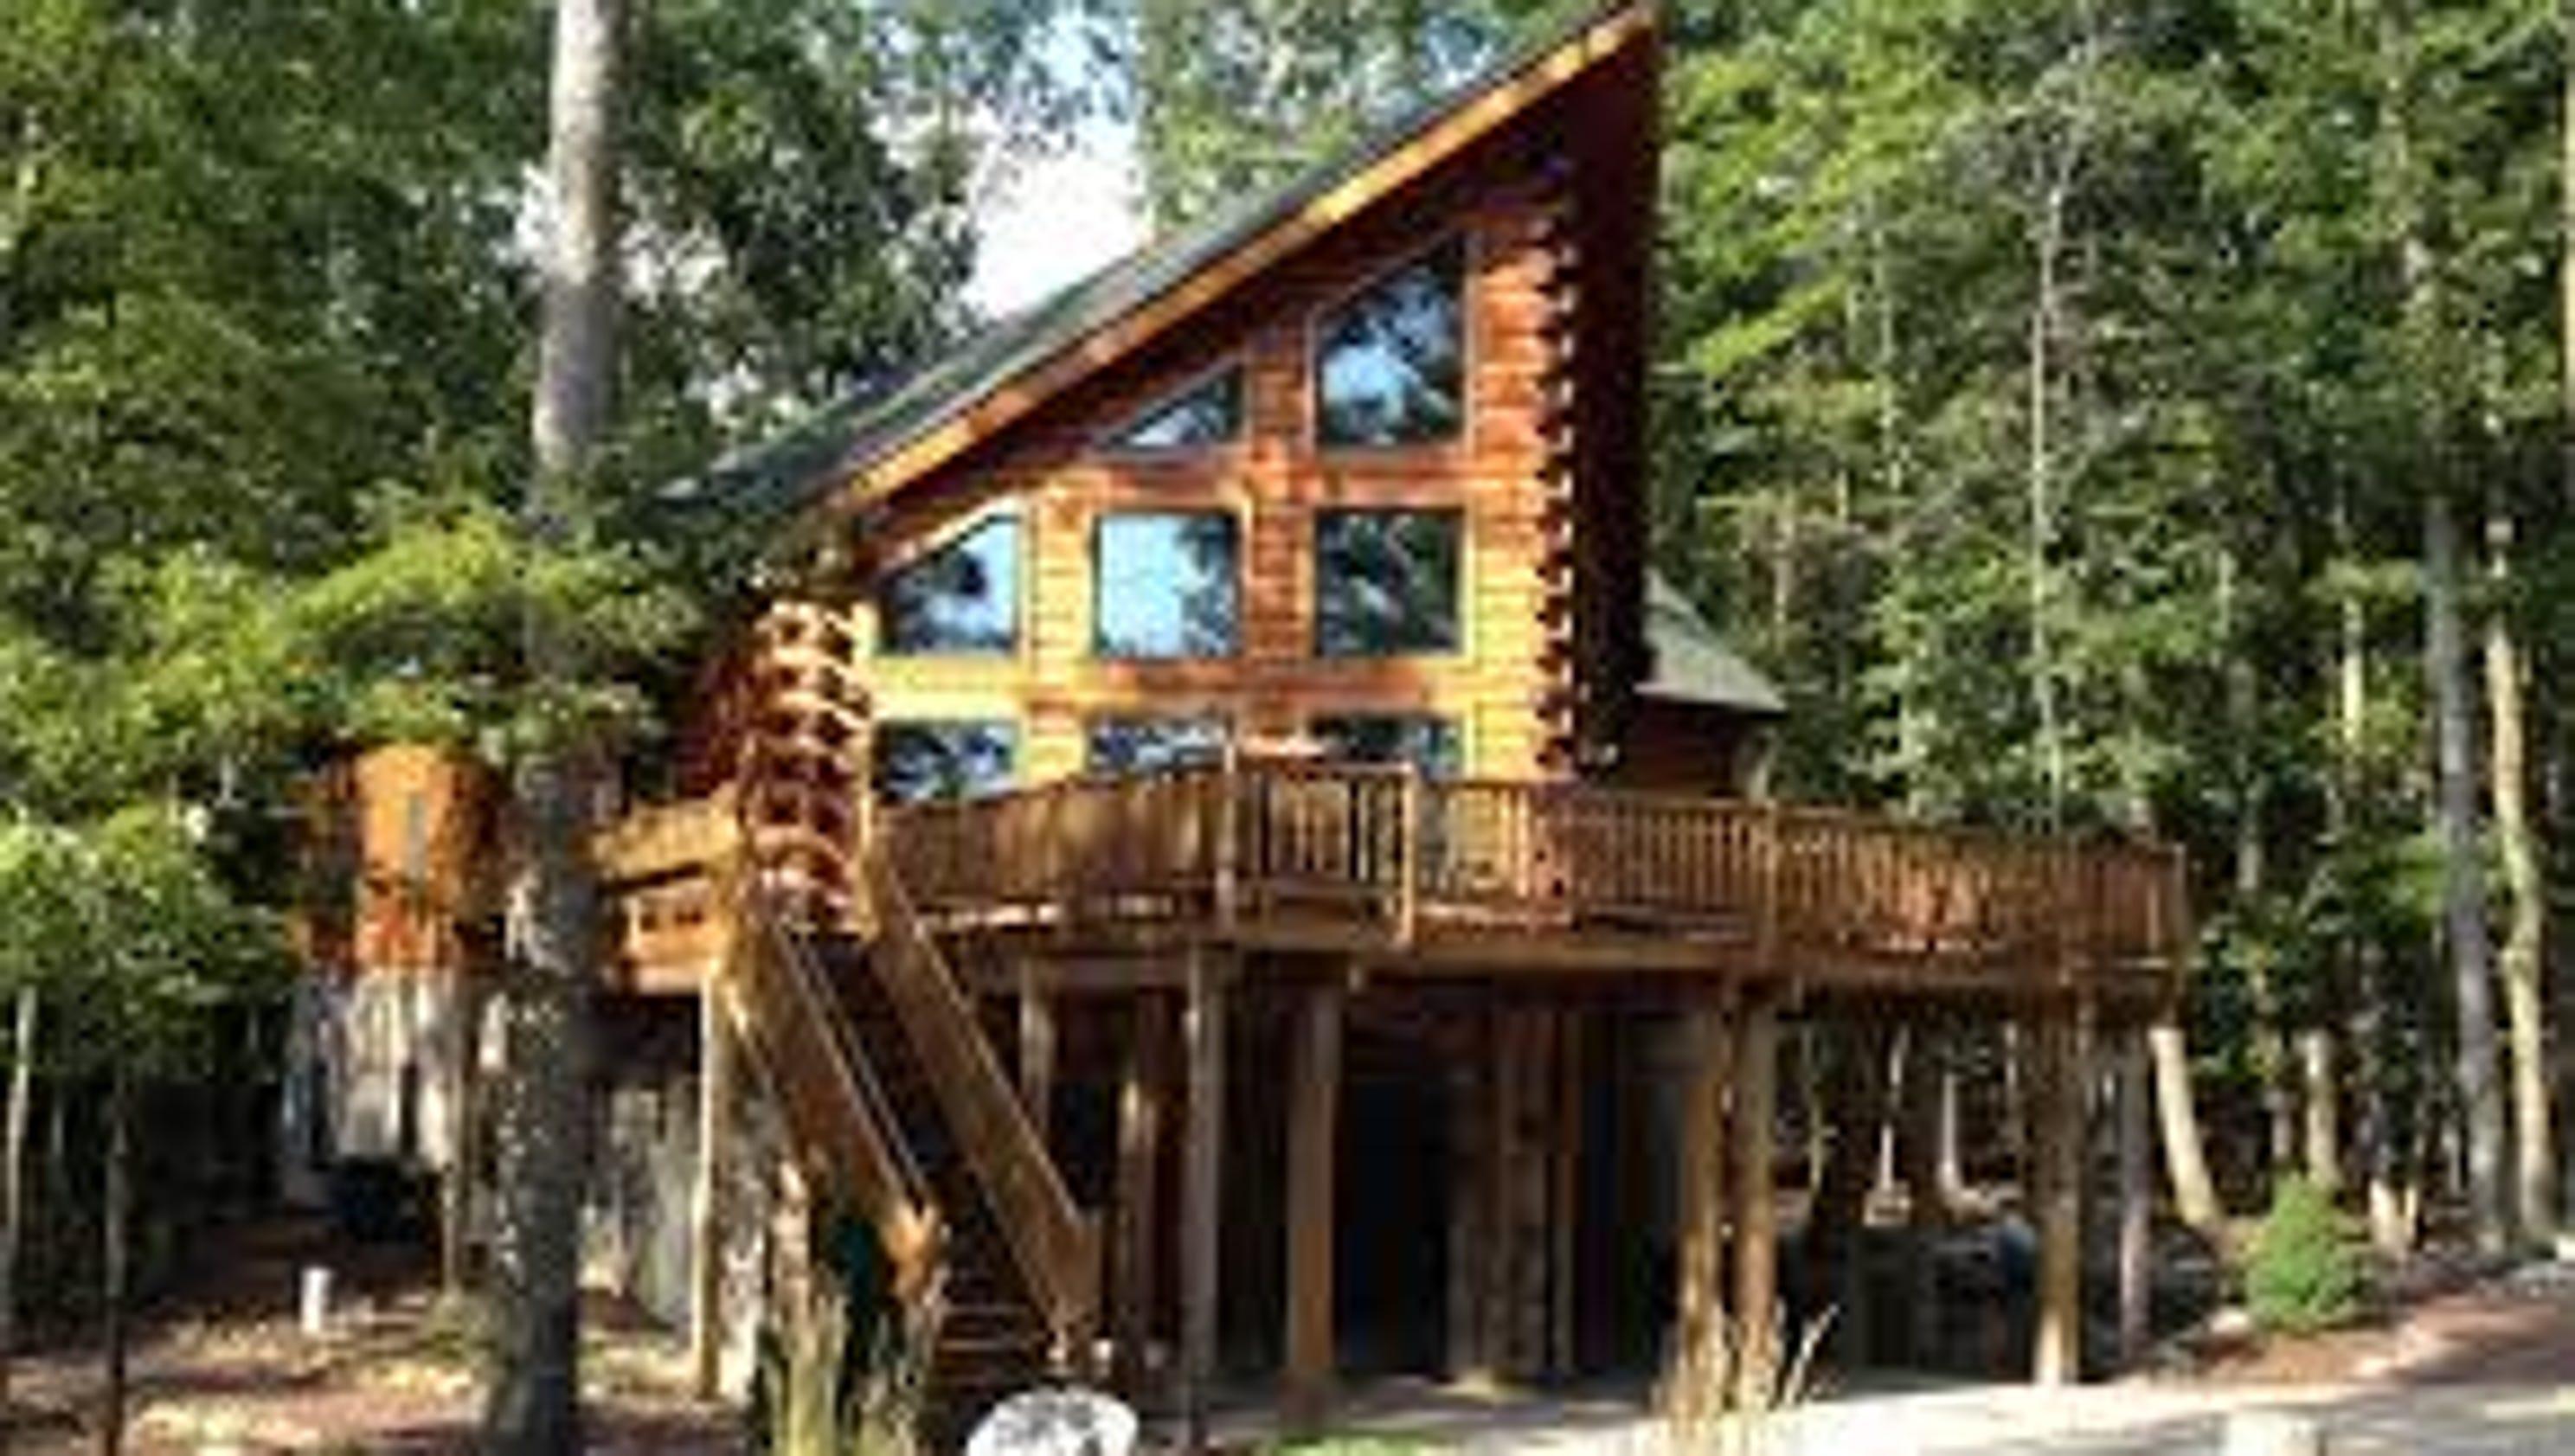 mexico park rental photo cabin ruidoso campground rv cabins bonito hollow gallery new img